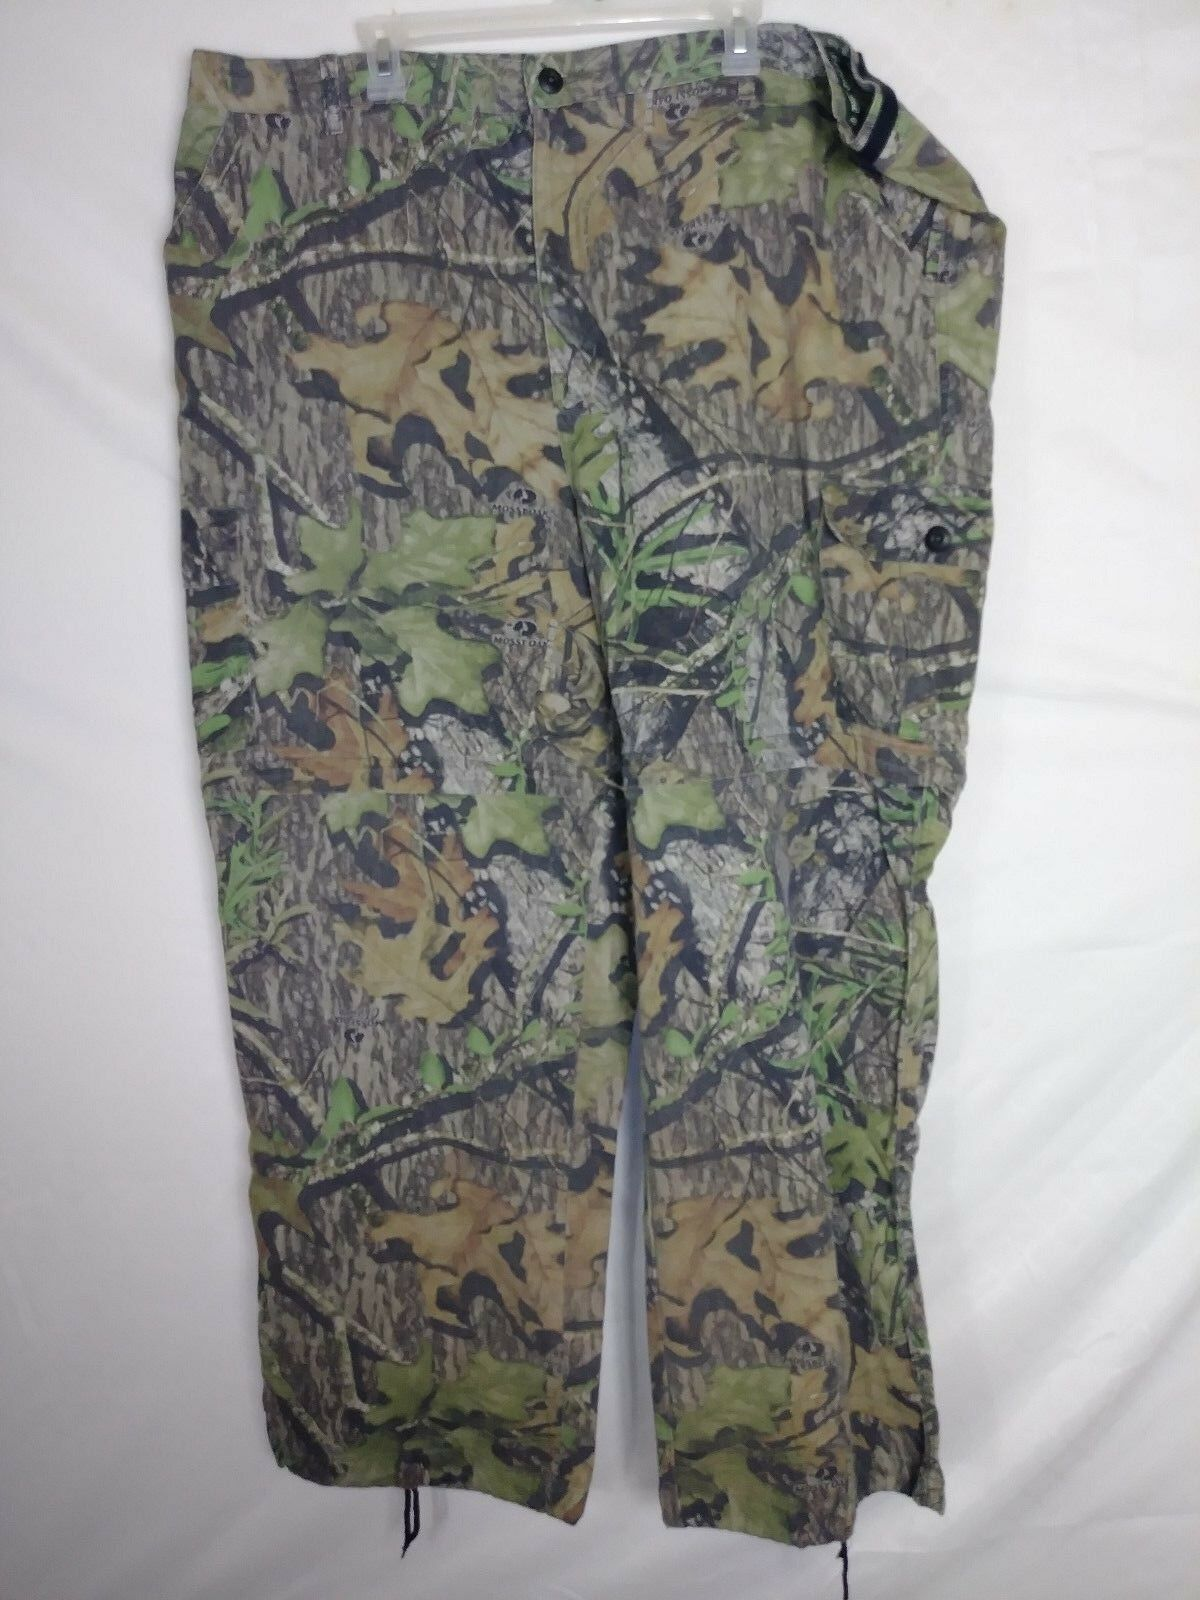 Field Staff Mossy Oak Mens Congreenible Pants Size 3XL Green Camo Hunting Cargo